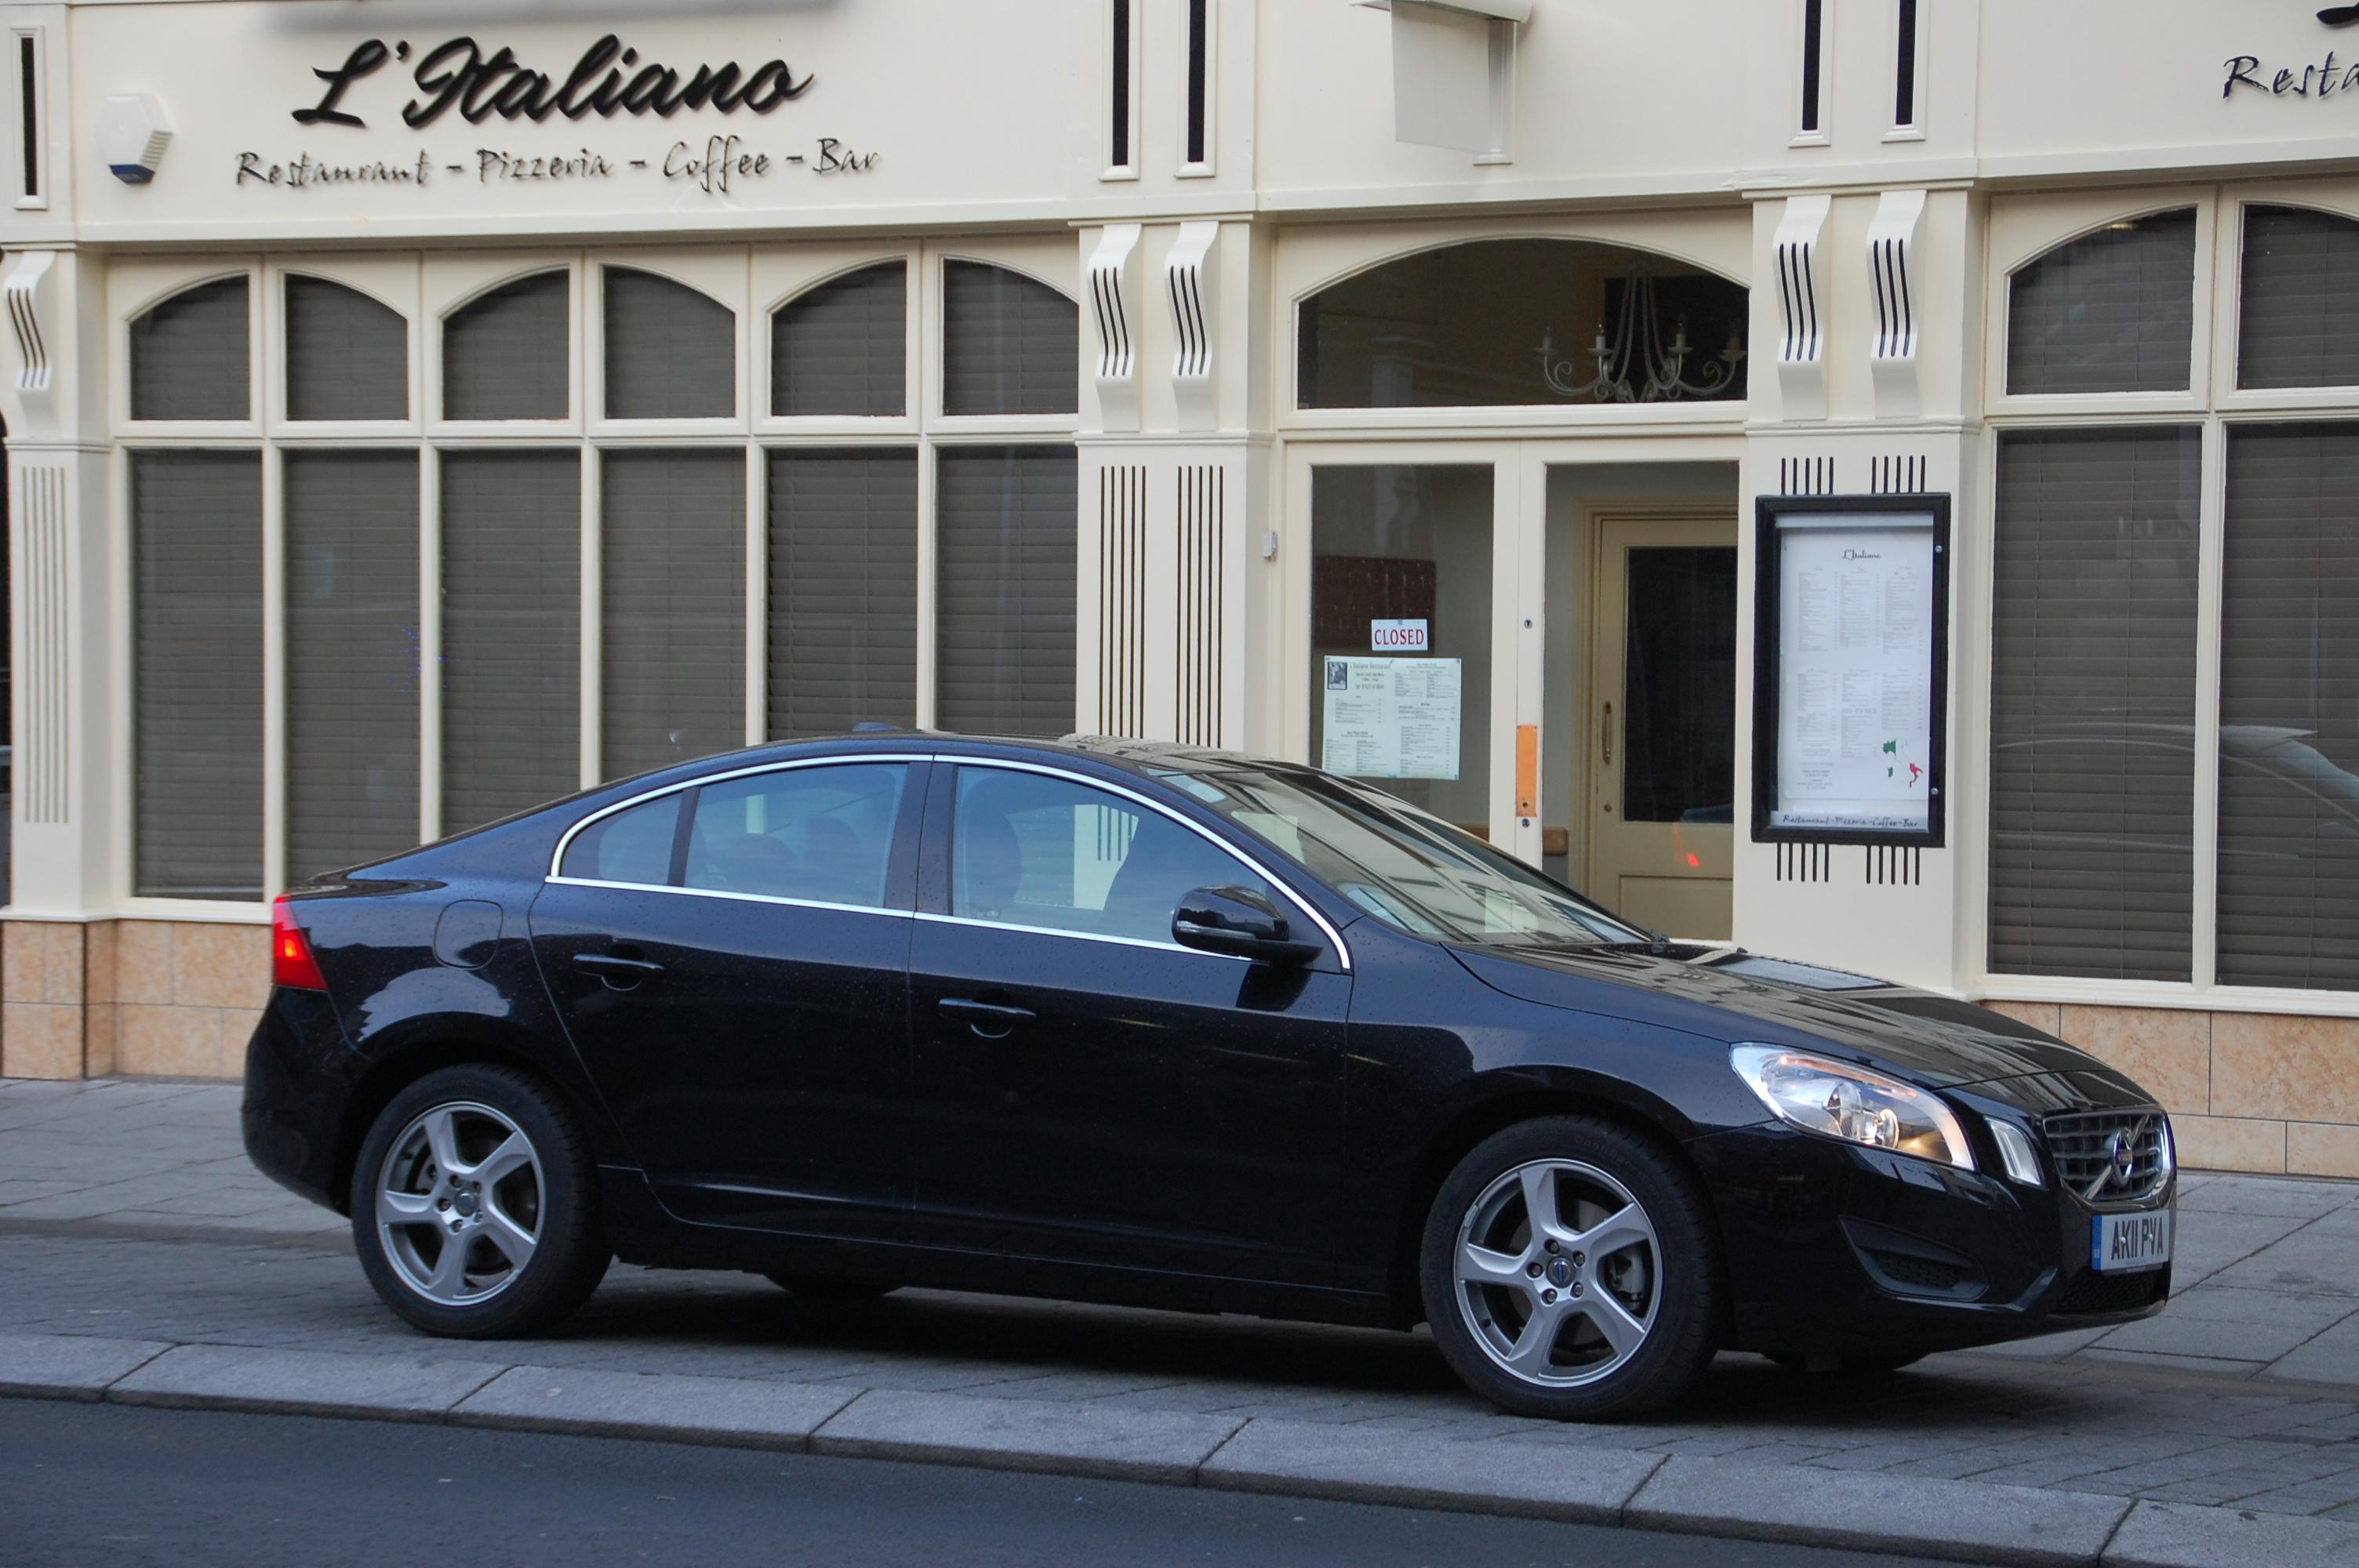 Volvo S60 D2 DRIVe SE Start/Stop Road Test « Petroleum Vitae